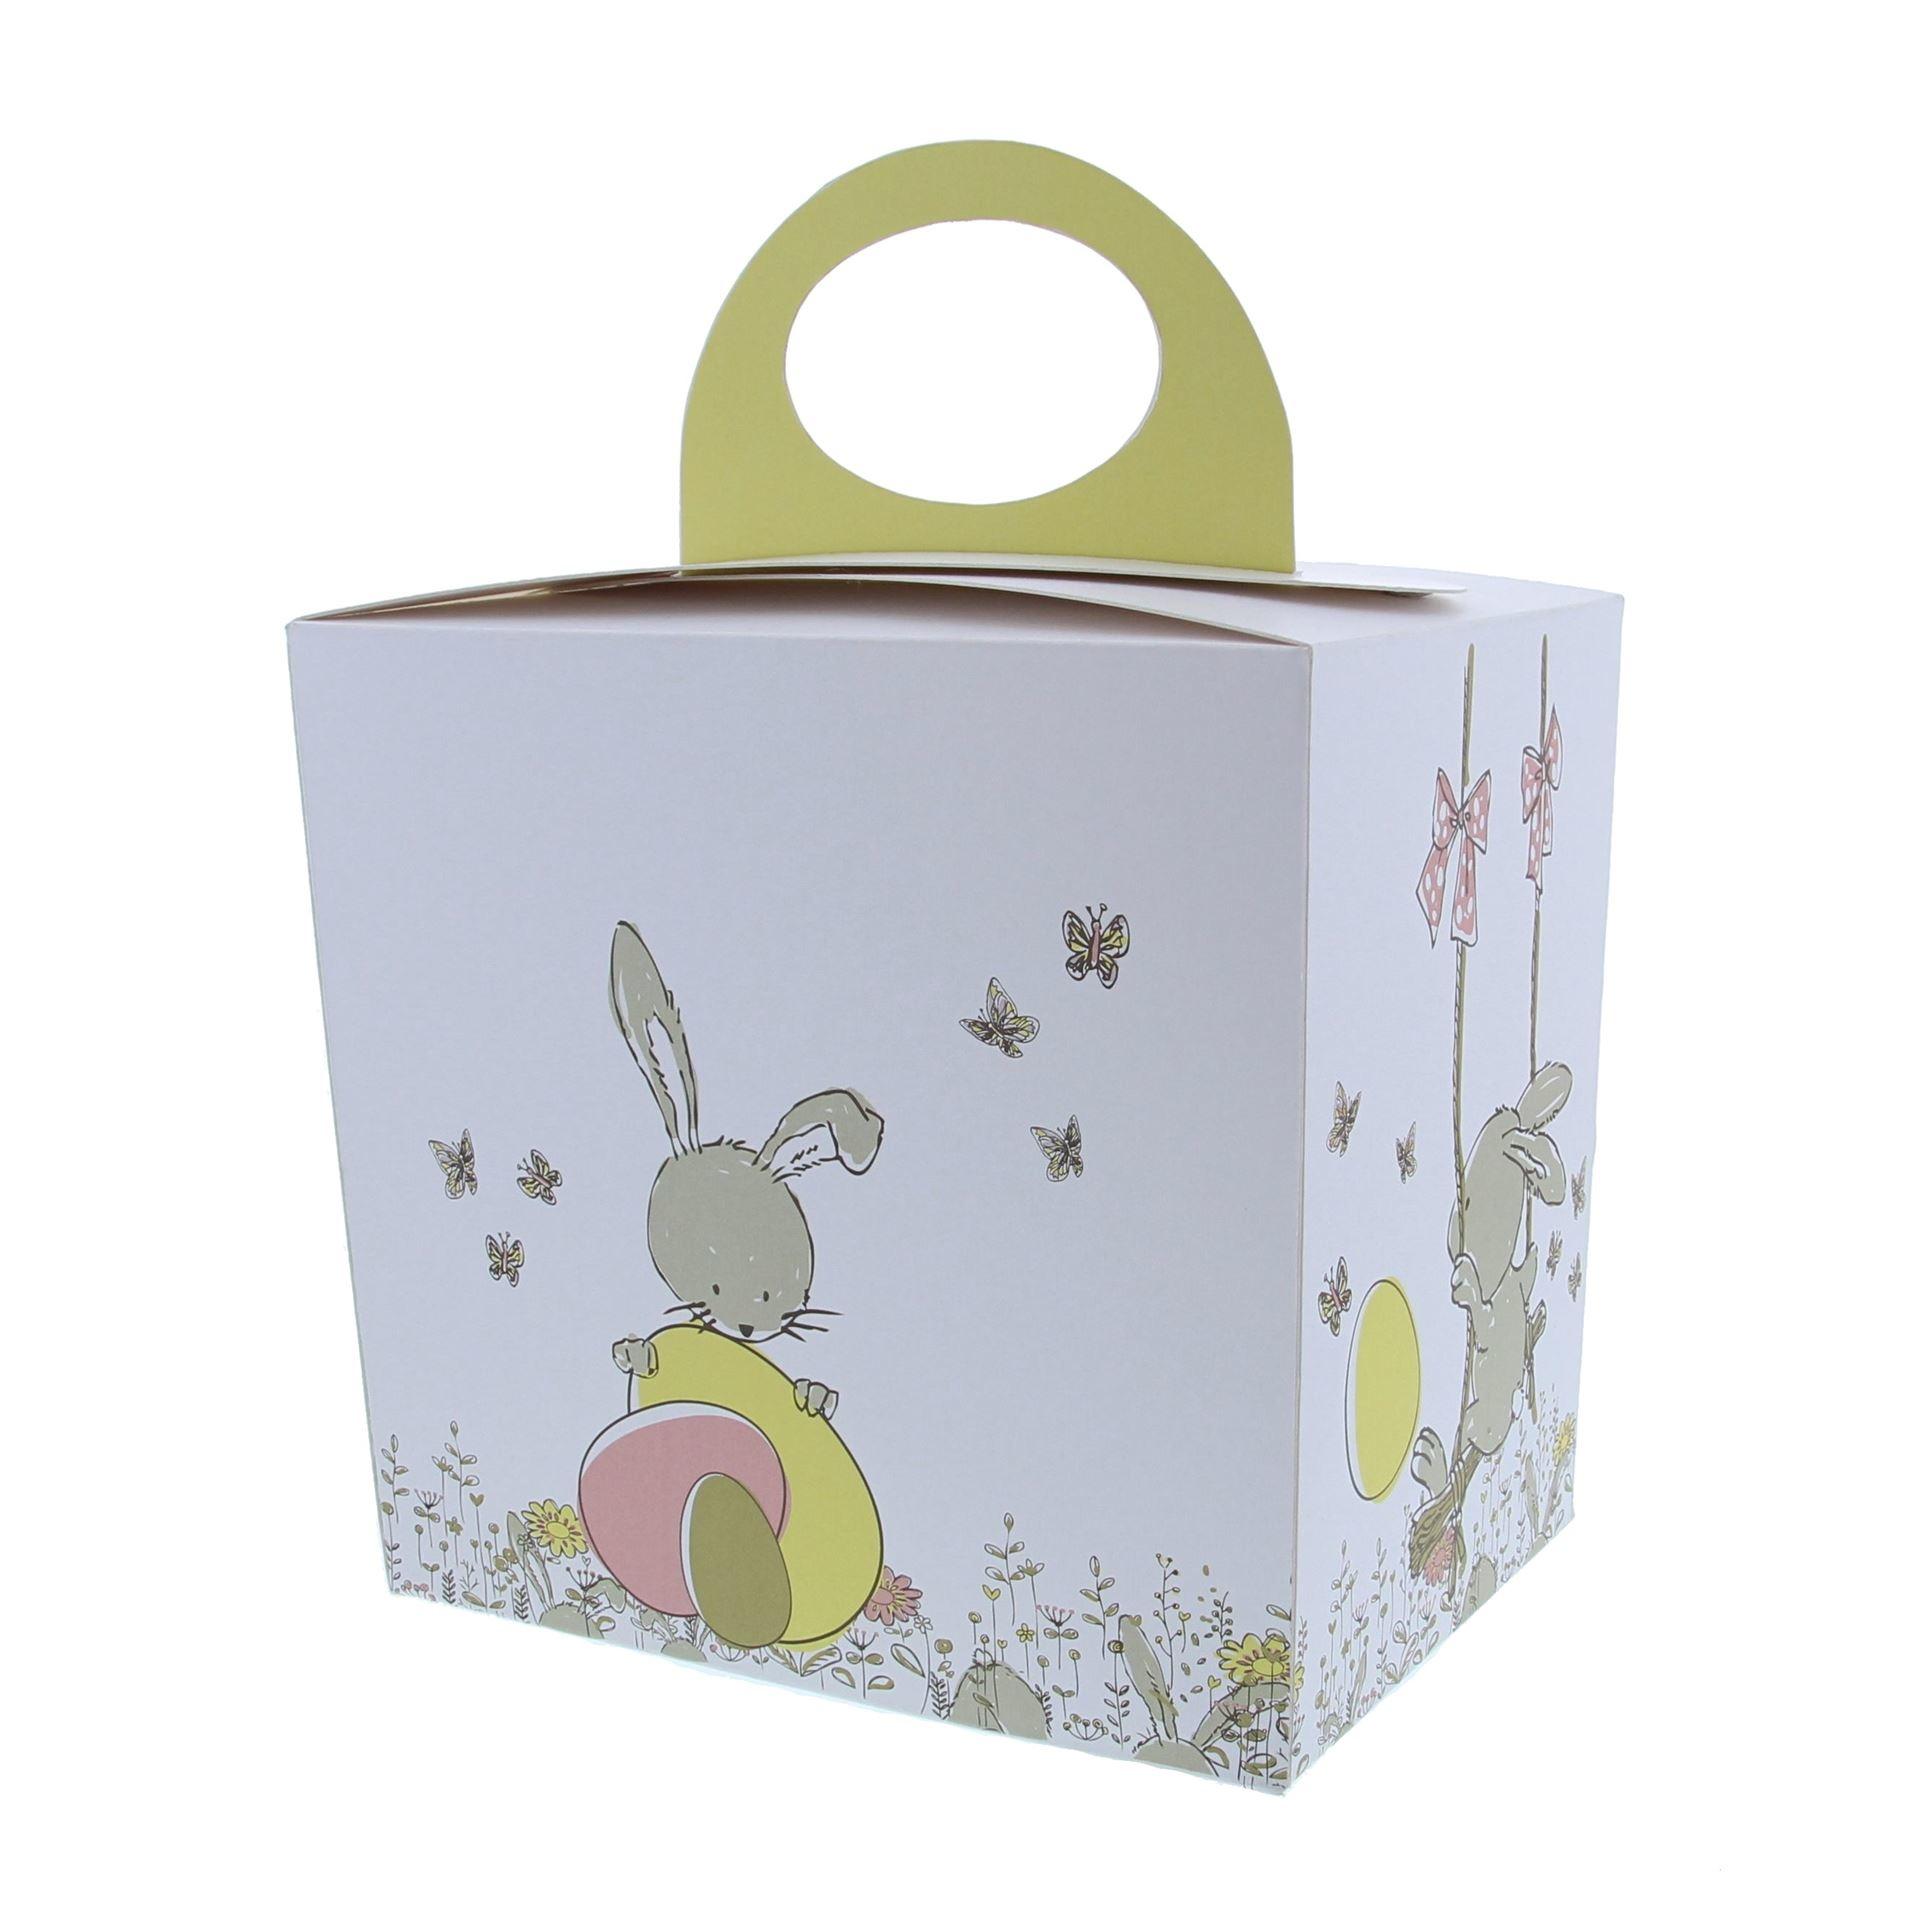 "Sac coffret Oeuf  ""Bunny Swing"" avec socle"